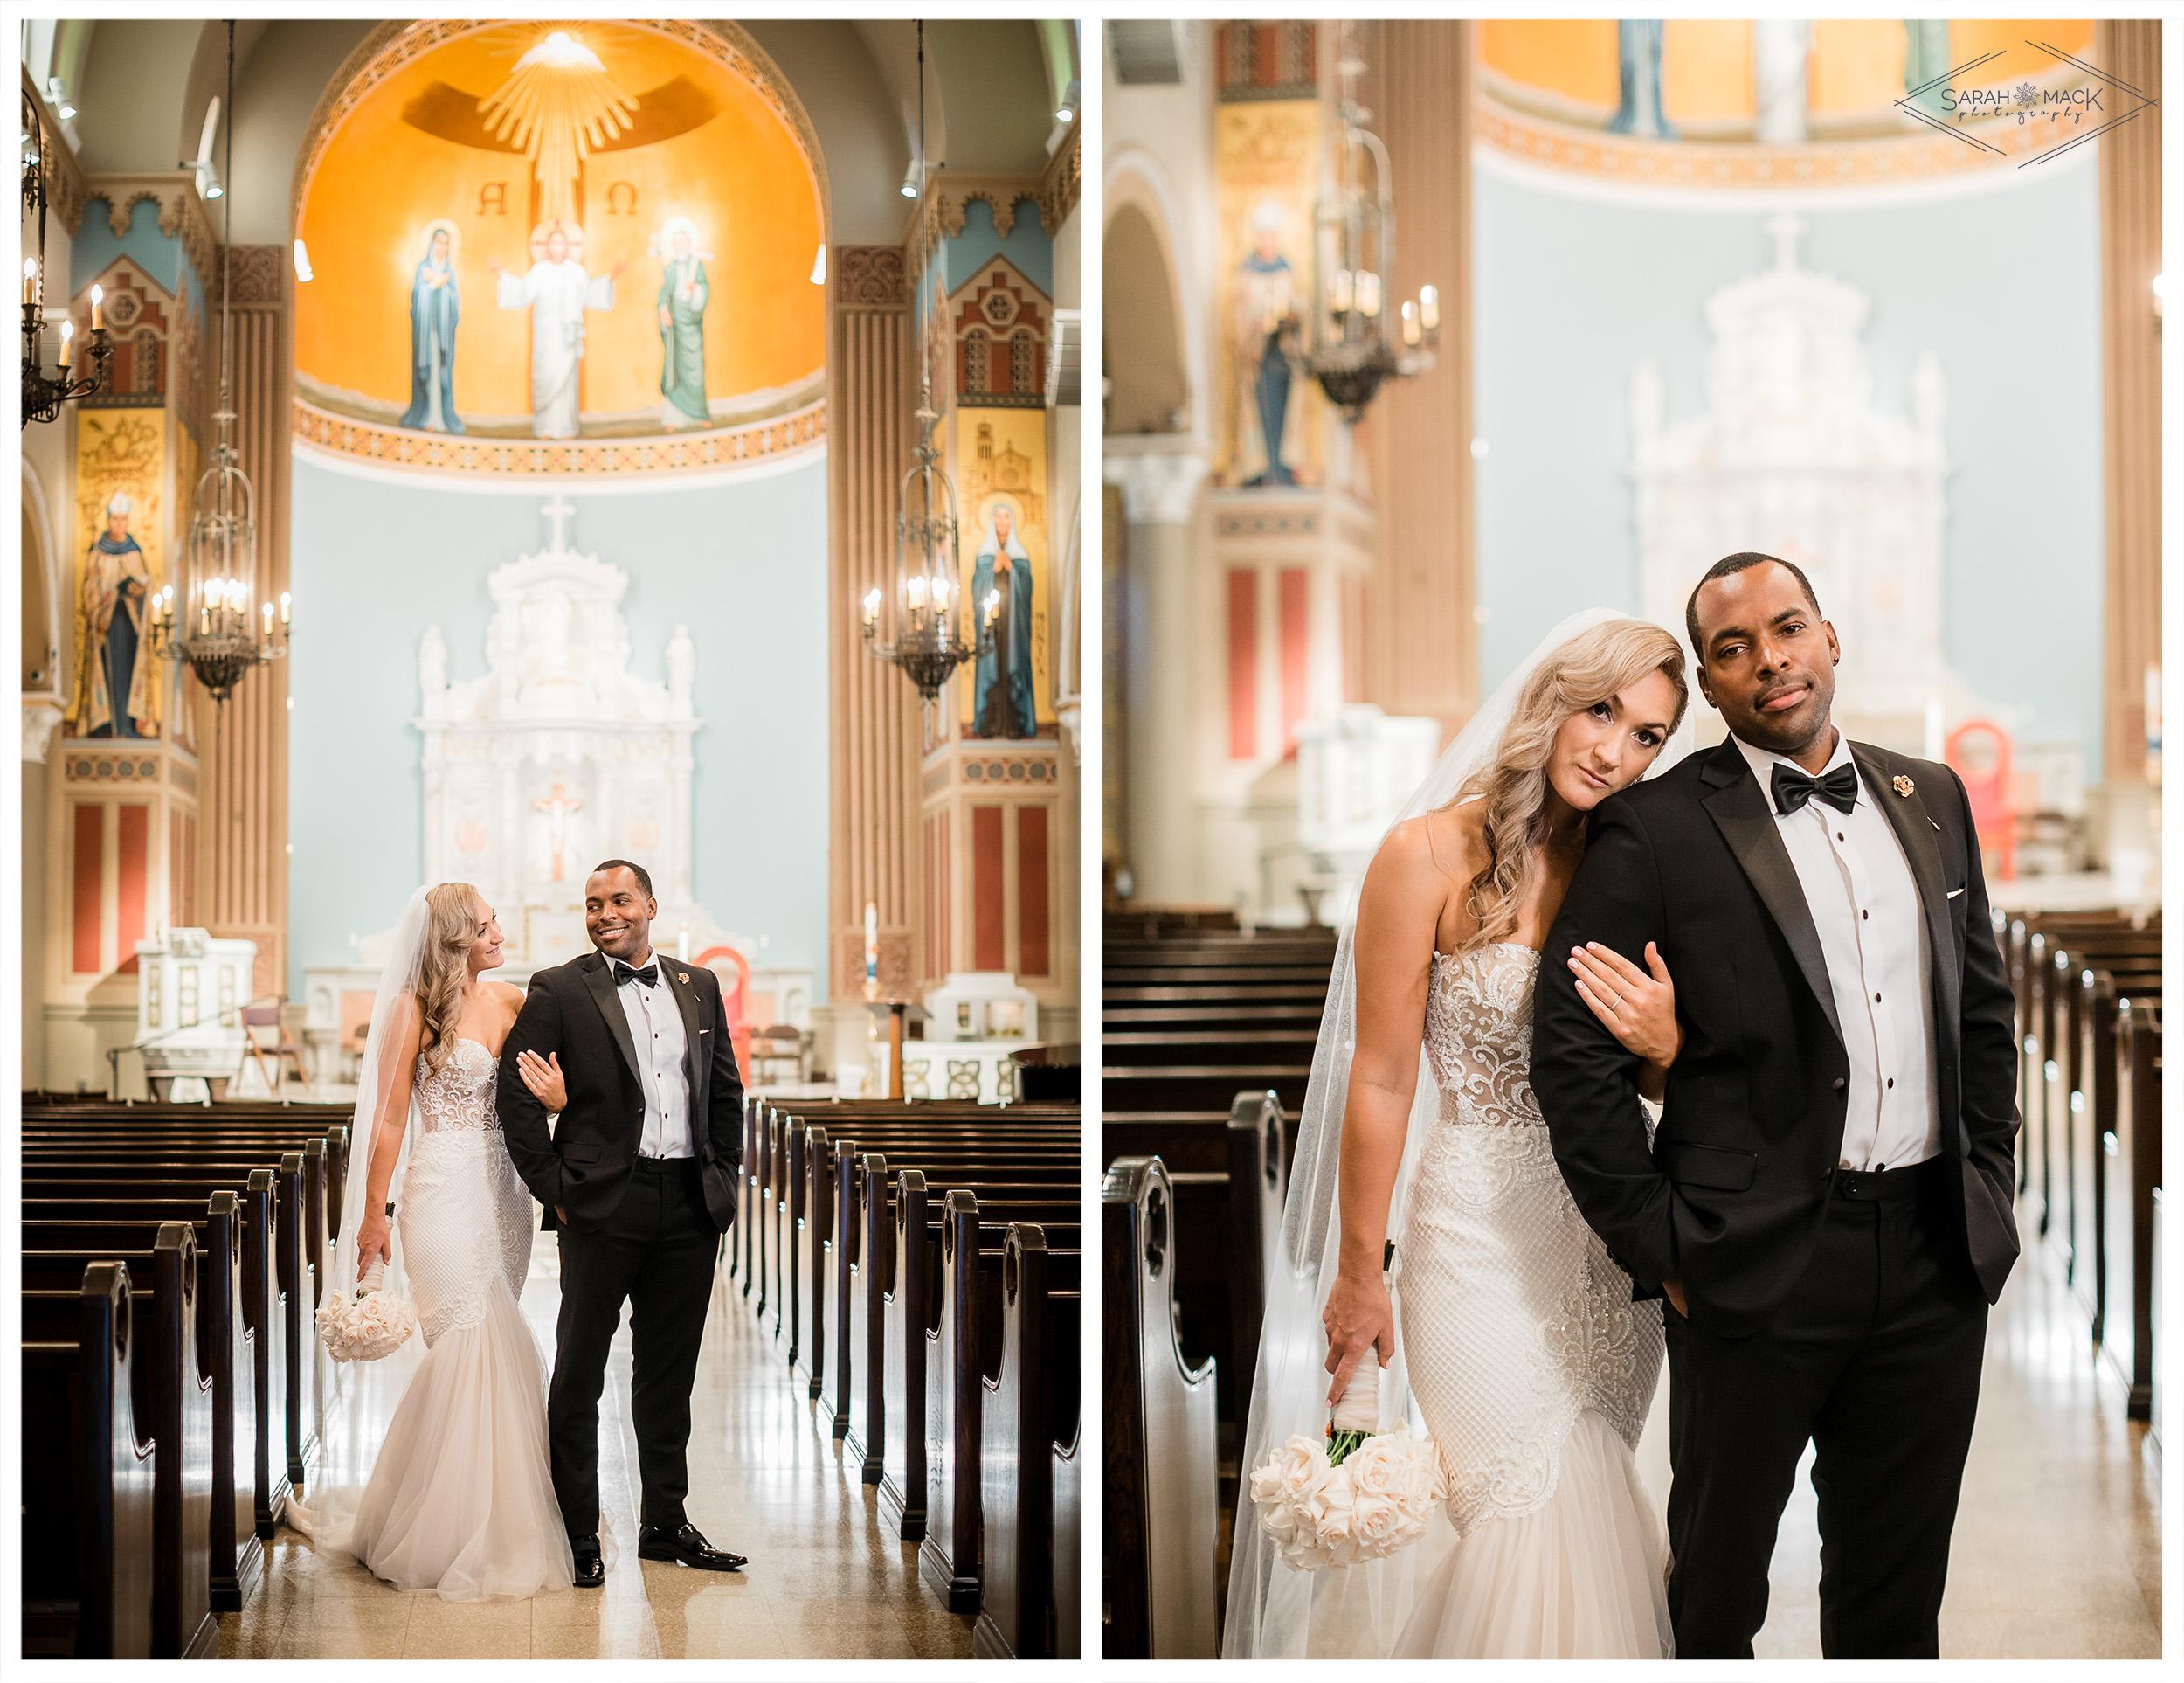 MK-Santa-Monica-Catholic-Church-Wedding-Photography-38.jpg